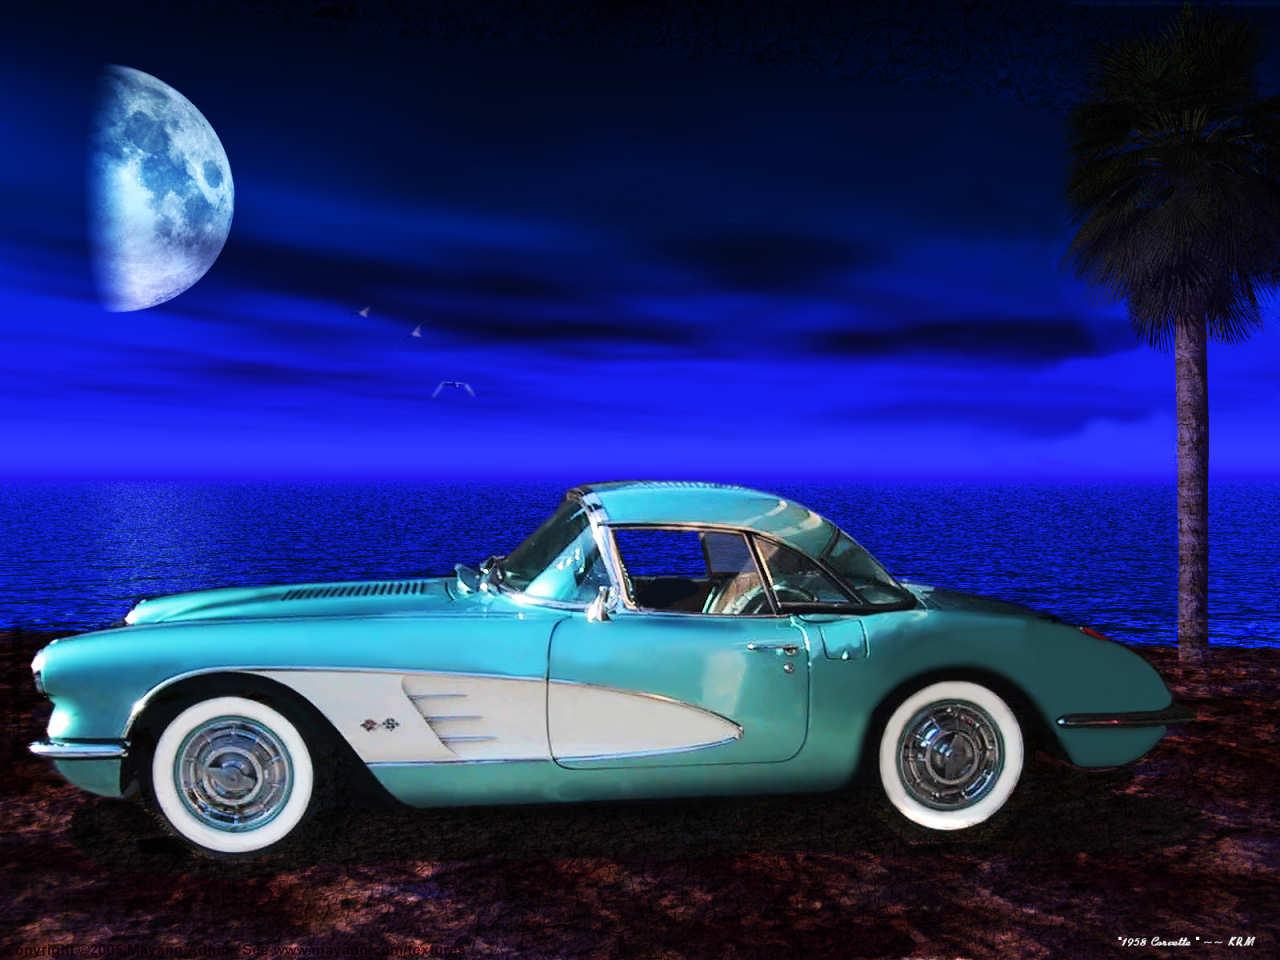 Click image for larger version  Name:AM_21 1958 Corvette=KRM.jpg Views:220 Size:113.5 KB ID:21532